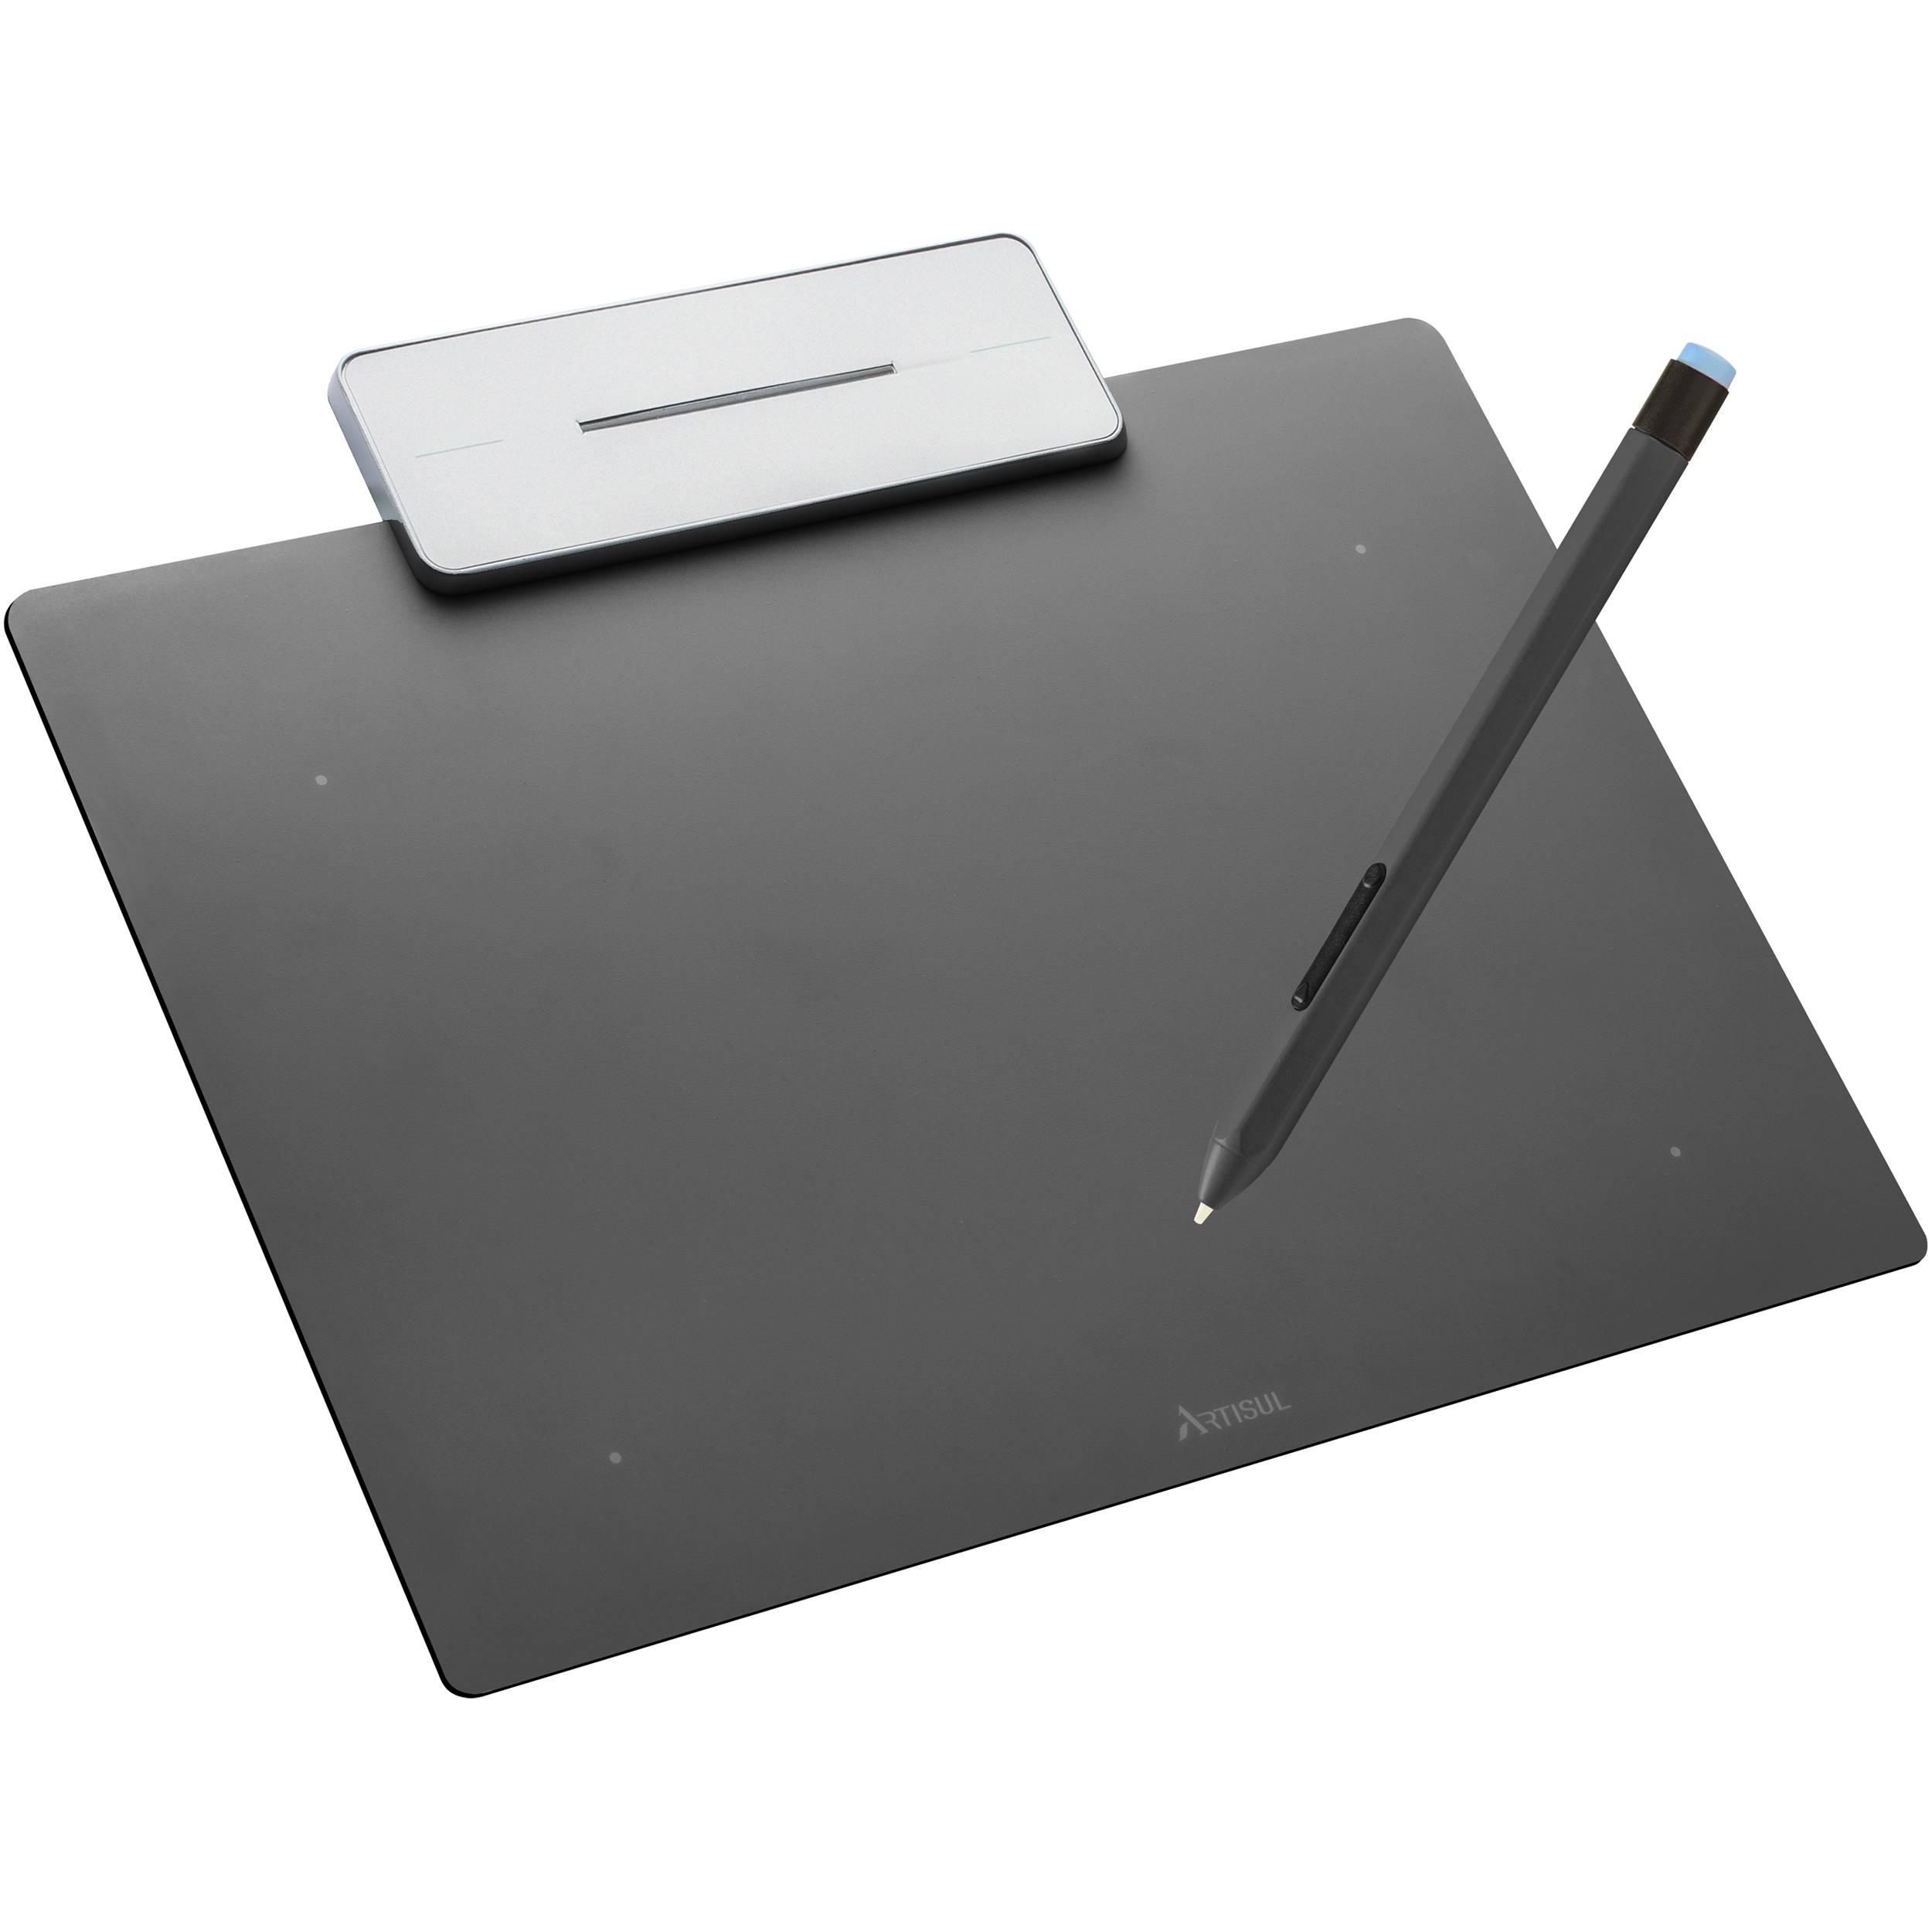 Artisul pencil sketchpad small metallic grey digital for Sketchpad com